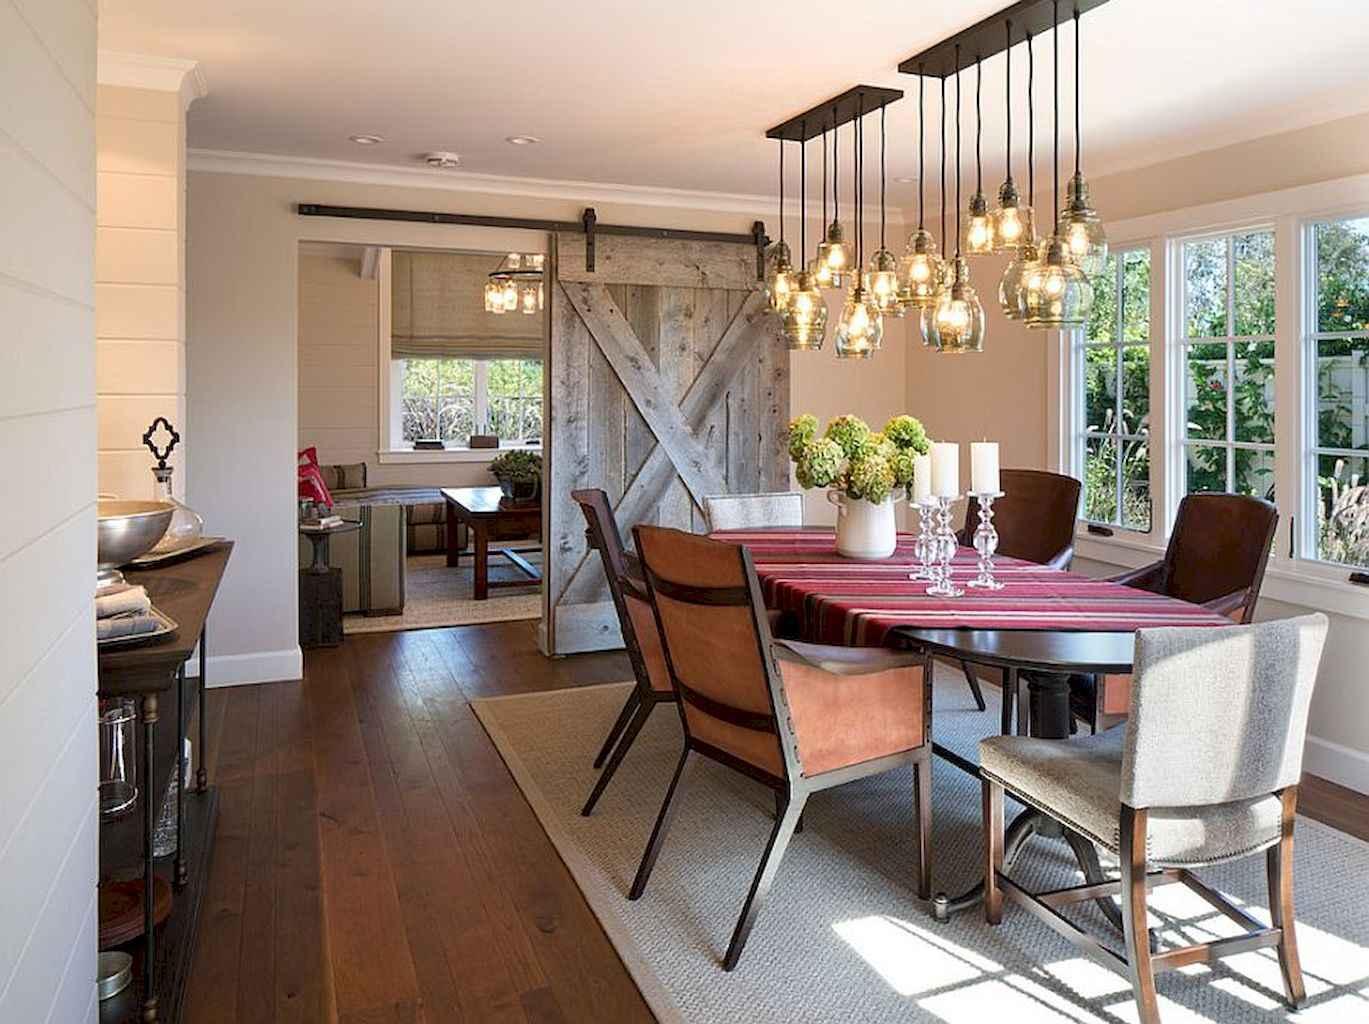 100 Rustic Farmhouse Dining Room Decor Ideas (76)